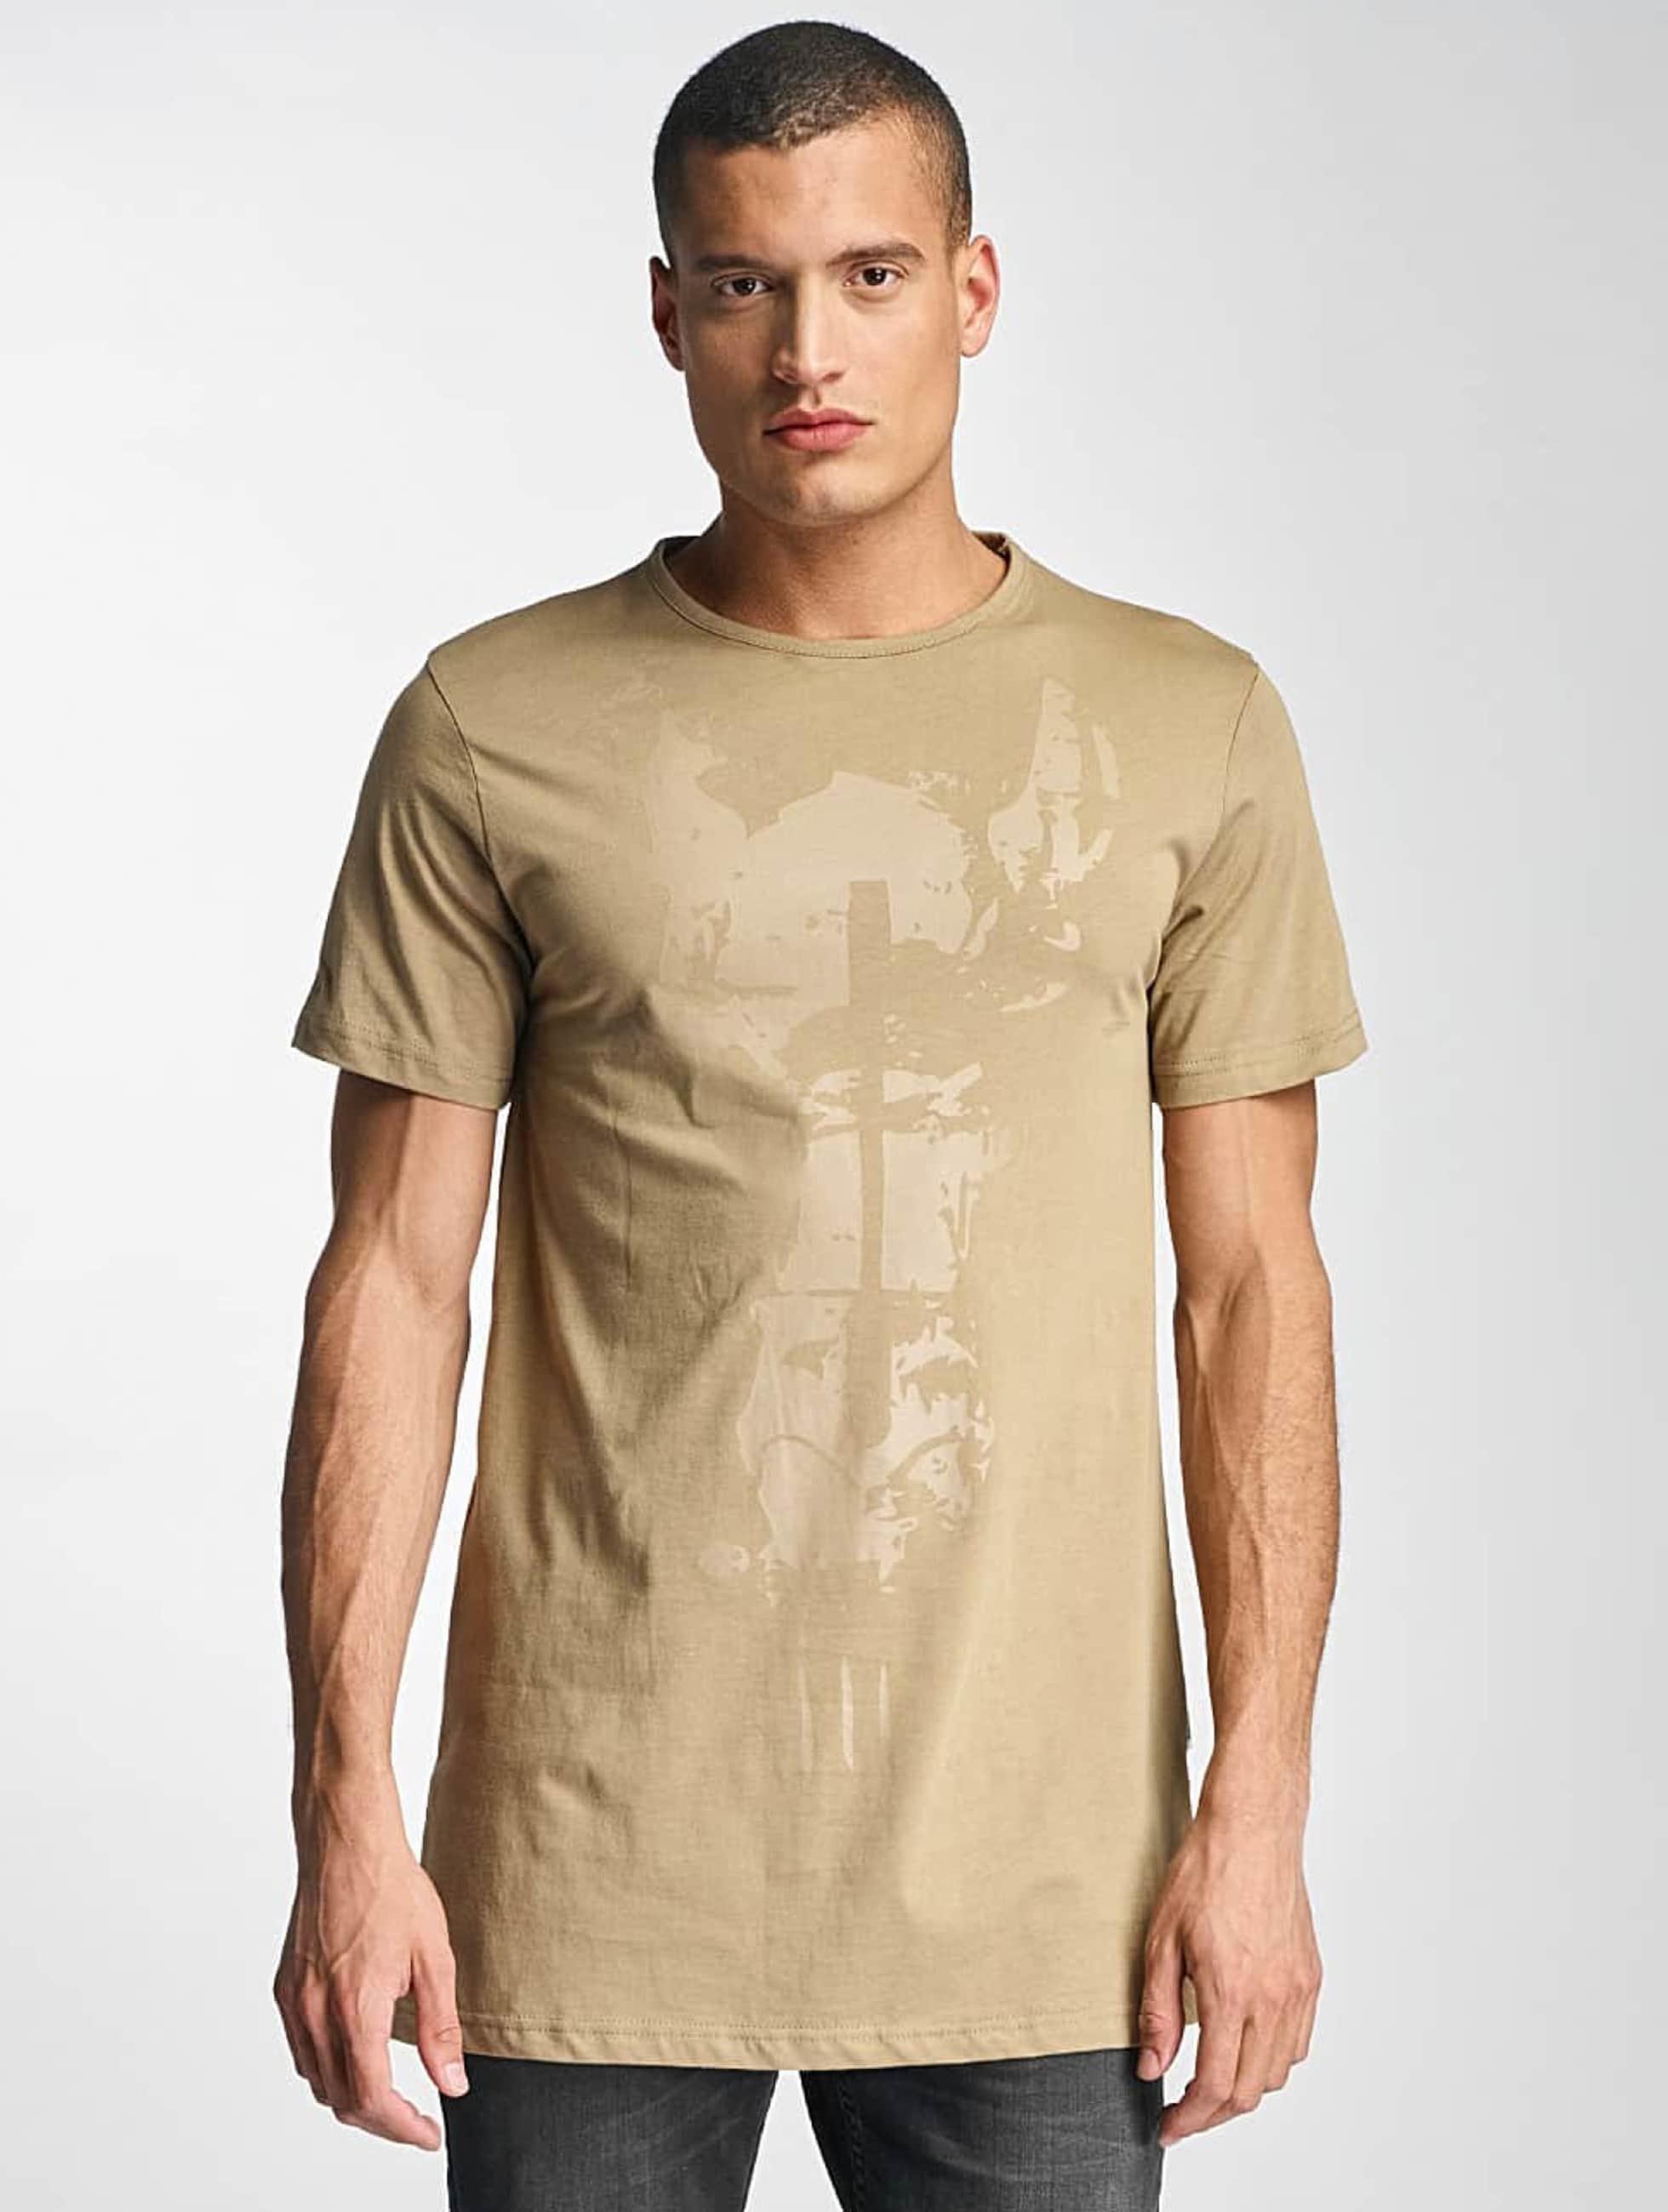 Cavallo de Ferro Männer T-Shirt Streets in beige